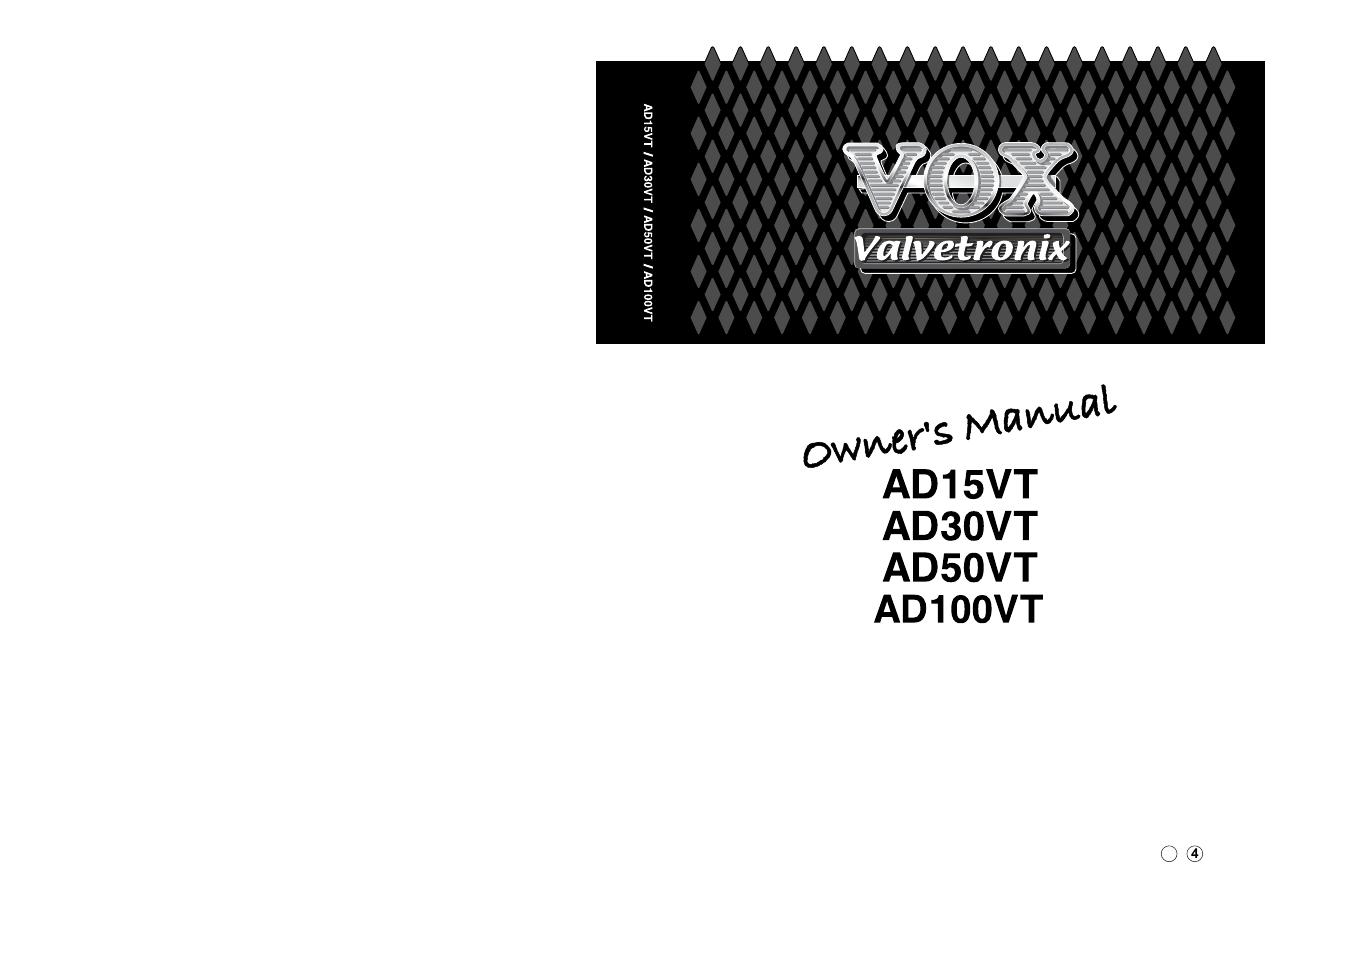 vox valvetronix ad50vt user manual 36 pages also for valvetronix ad15vt valvetronix ad30vt. Black Bedroom Furniture Sets. Home Design Ideas